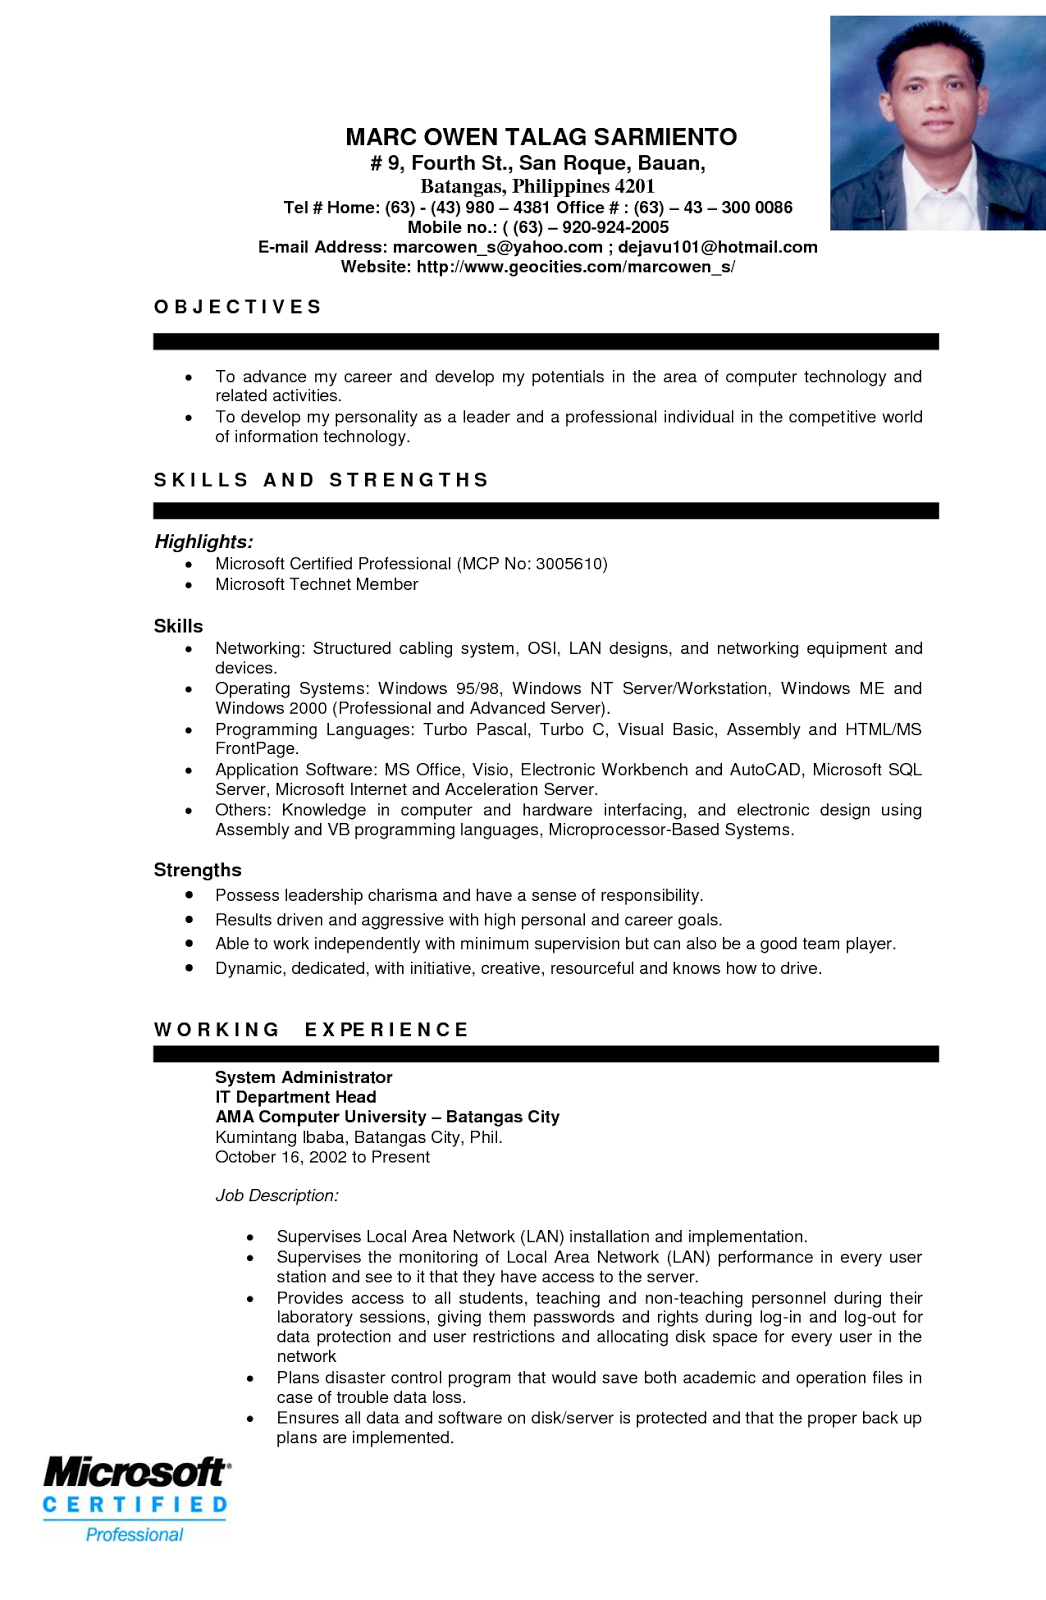 Resume Skills For Ojt Students